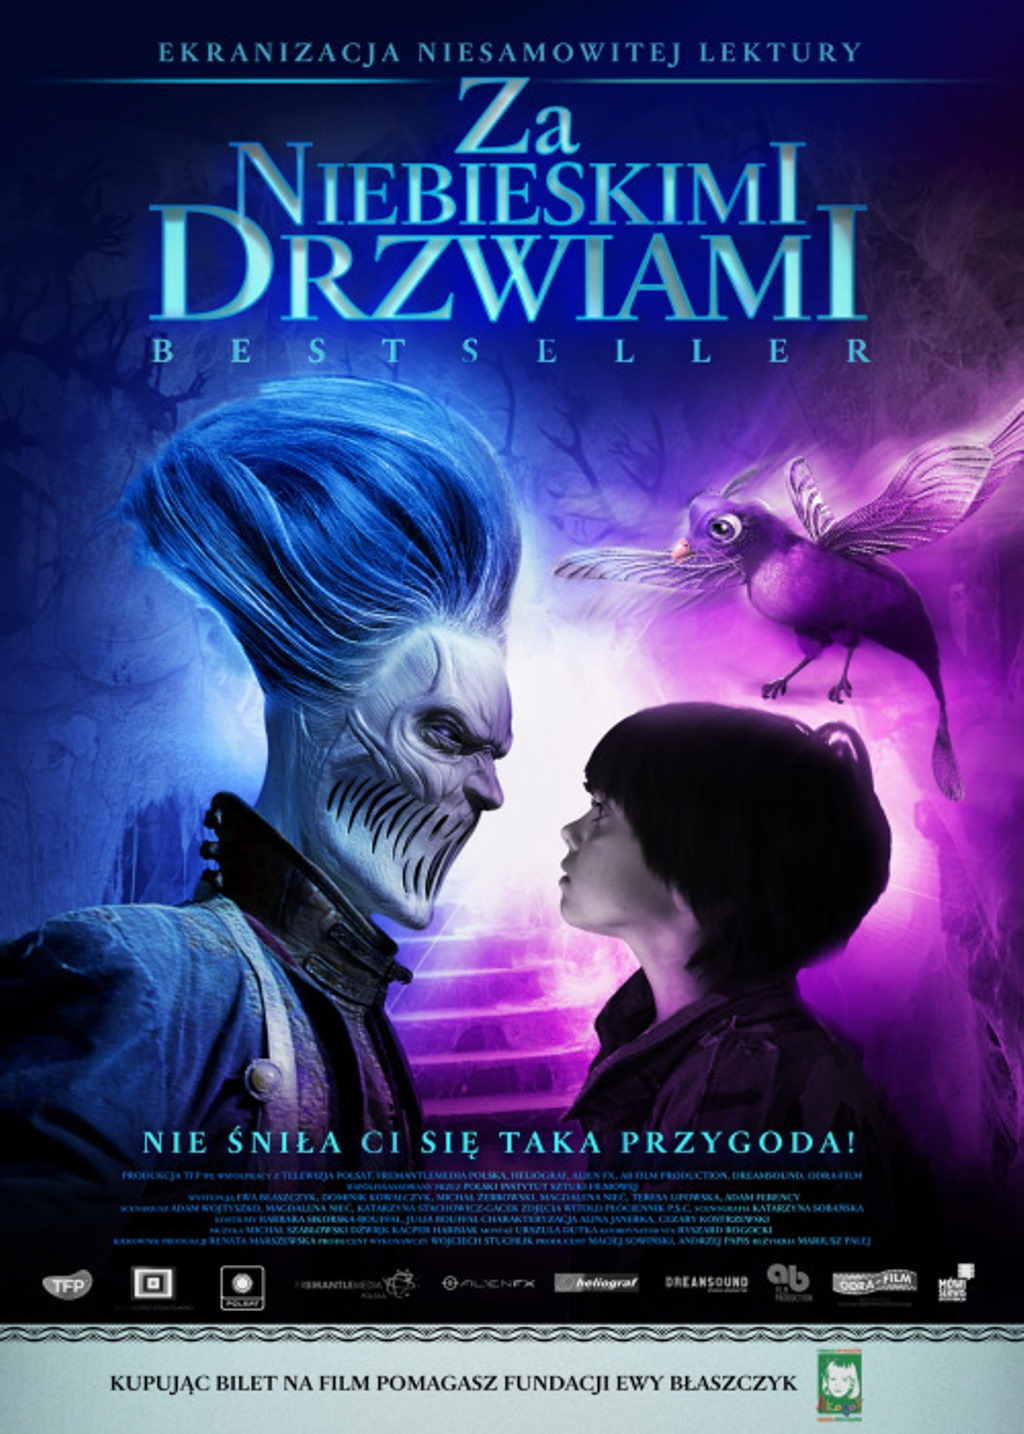 17-asis Lenkų kino festivalis : Už mėlynų durų (ZA NIEBIESKIMI DRZWIAMI)